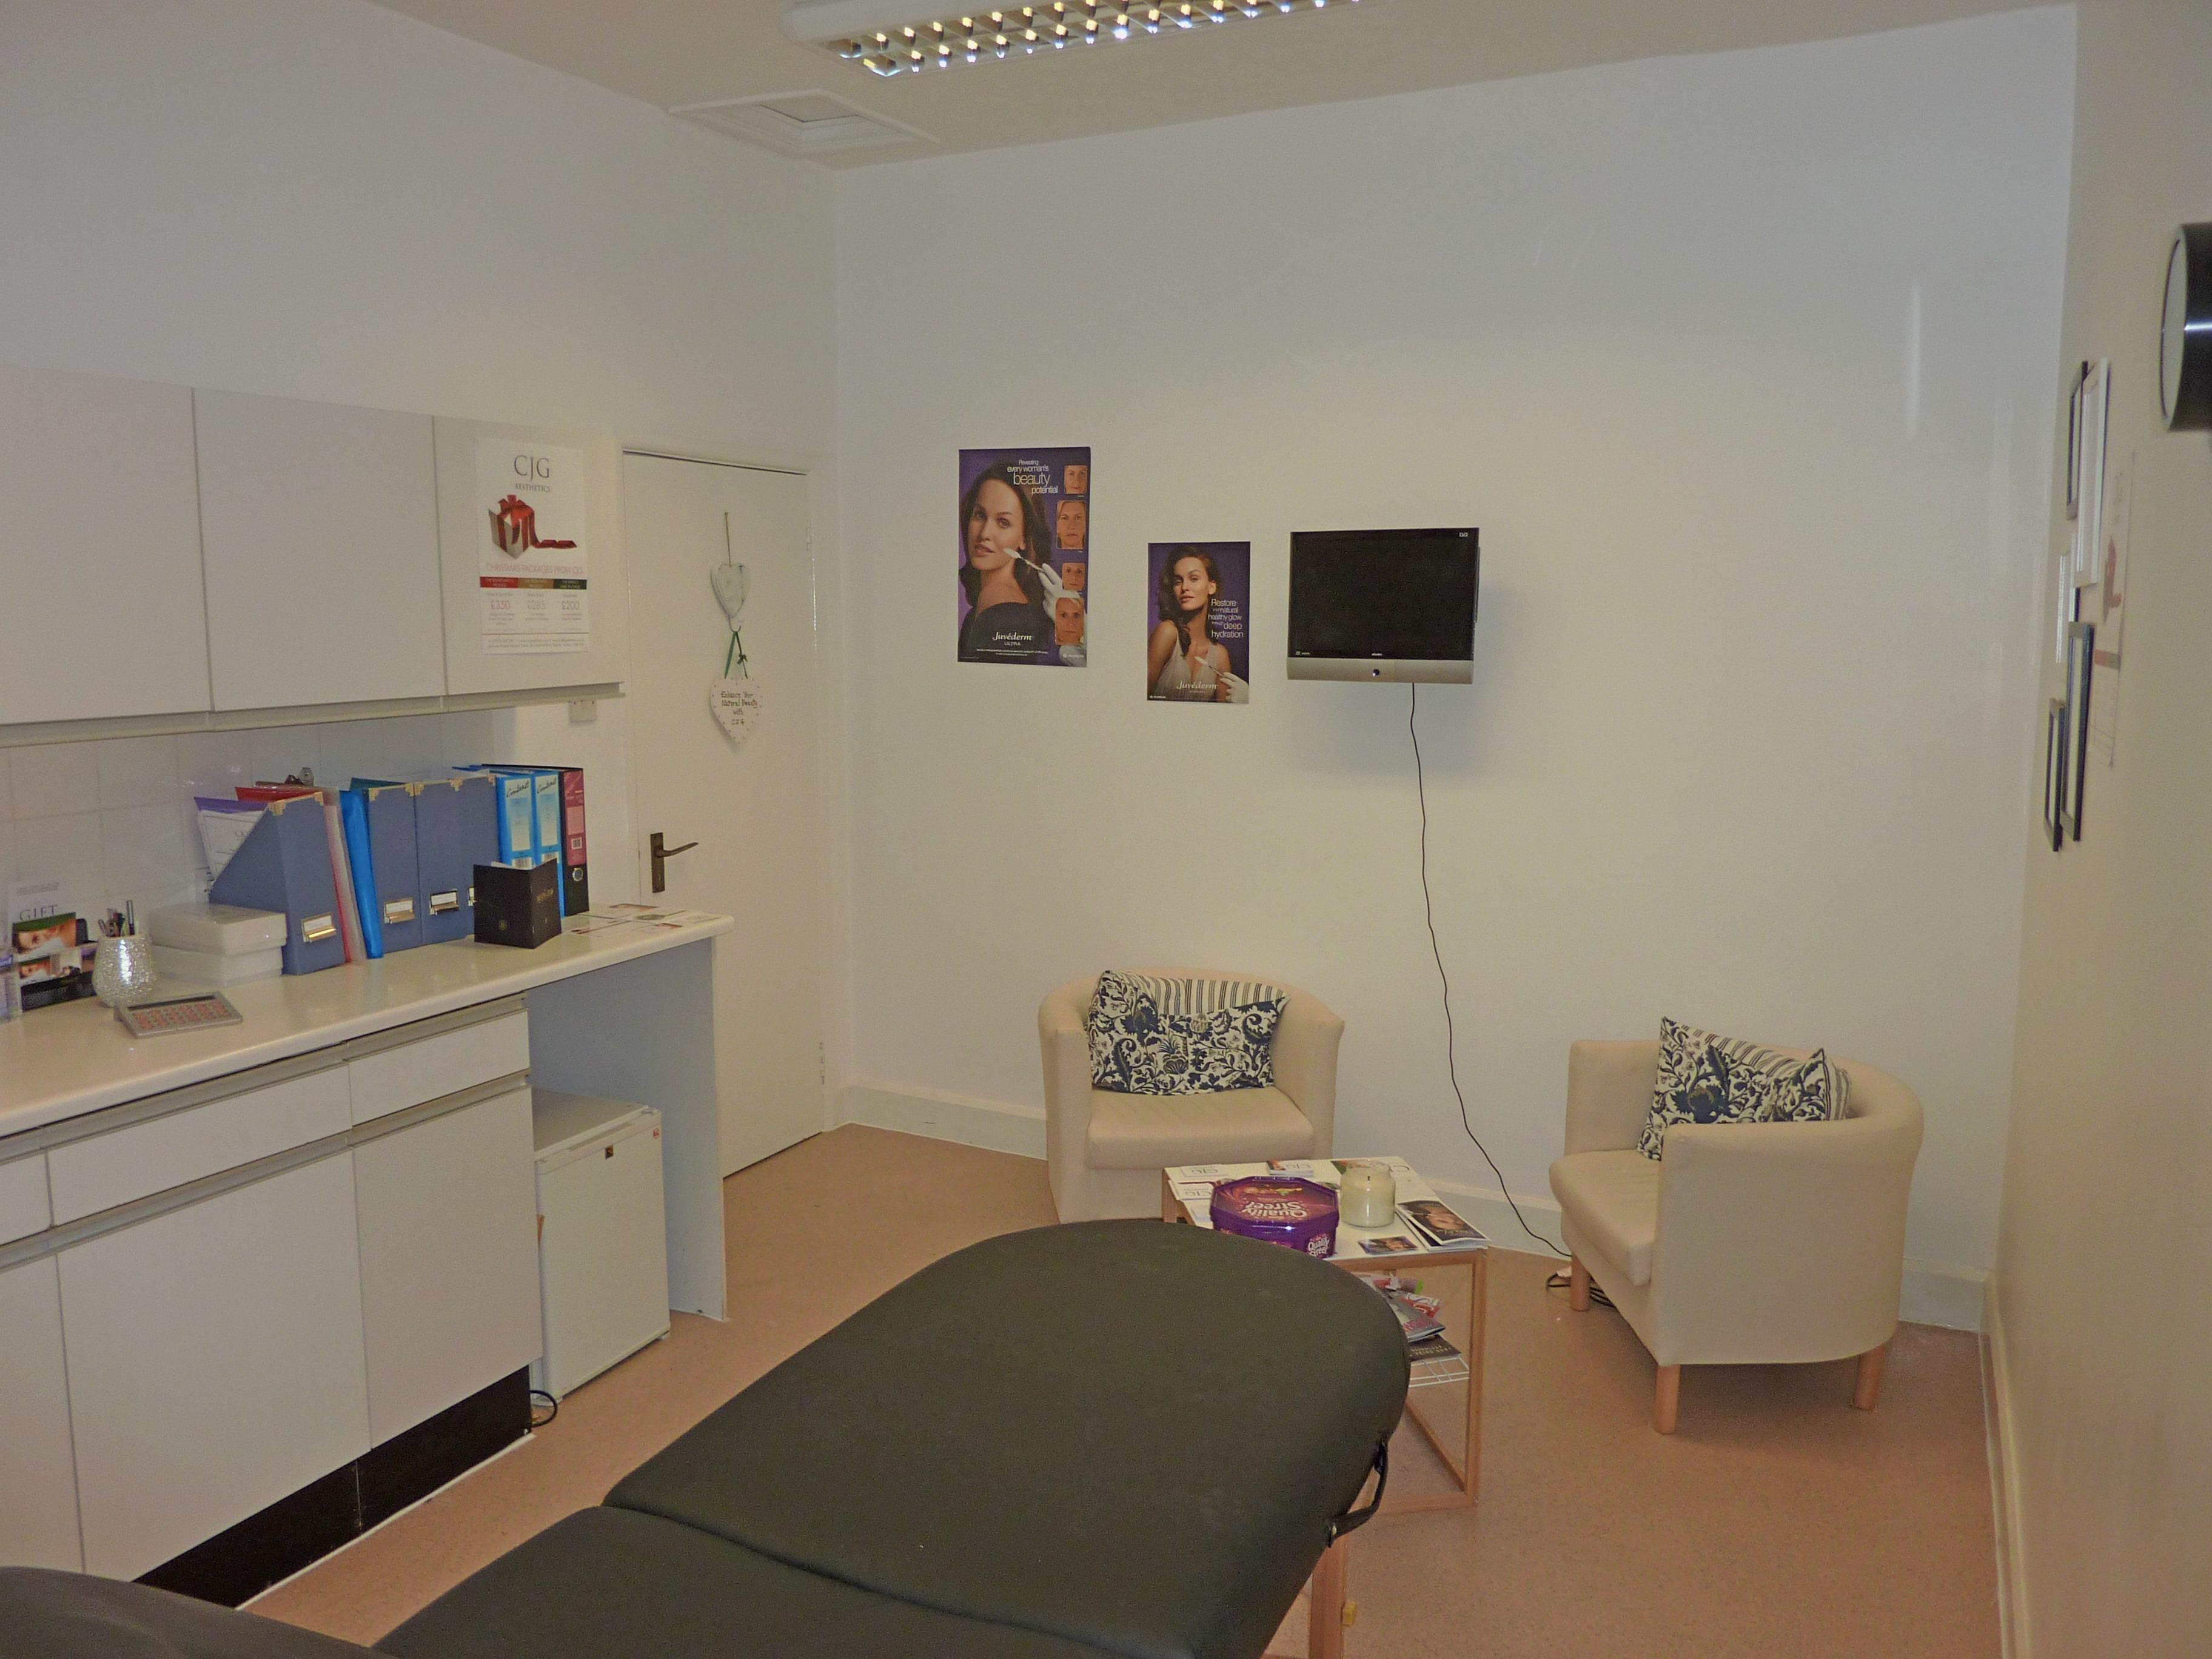 Treatment room hire